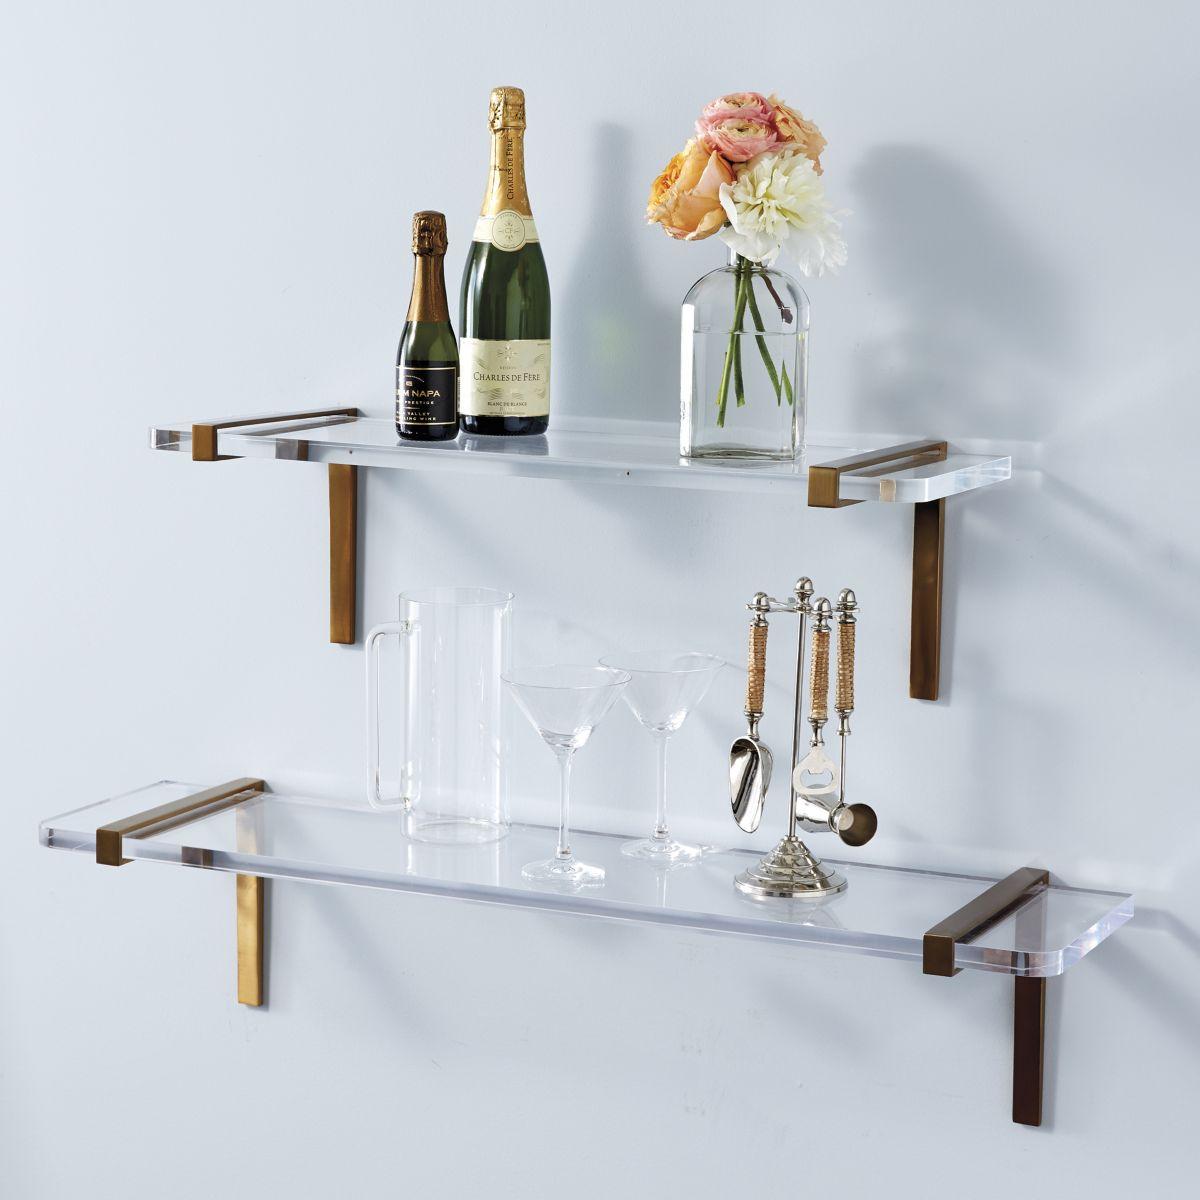 Custom Simple Shelf Acrylic Wall Mount Display Manufacturer